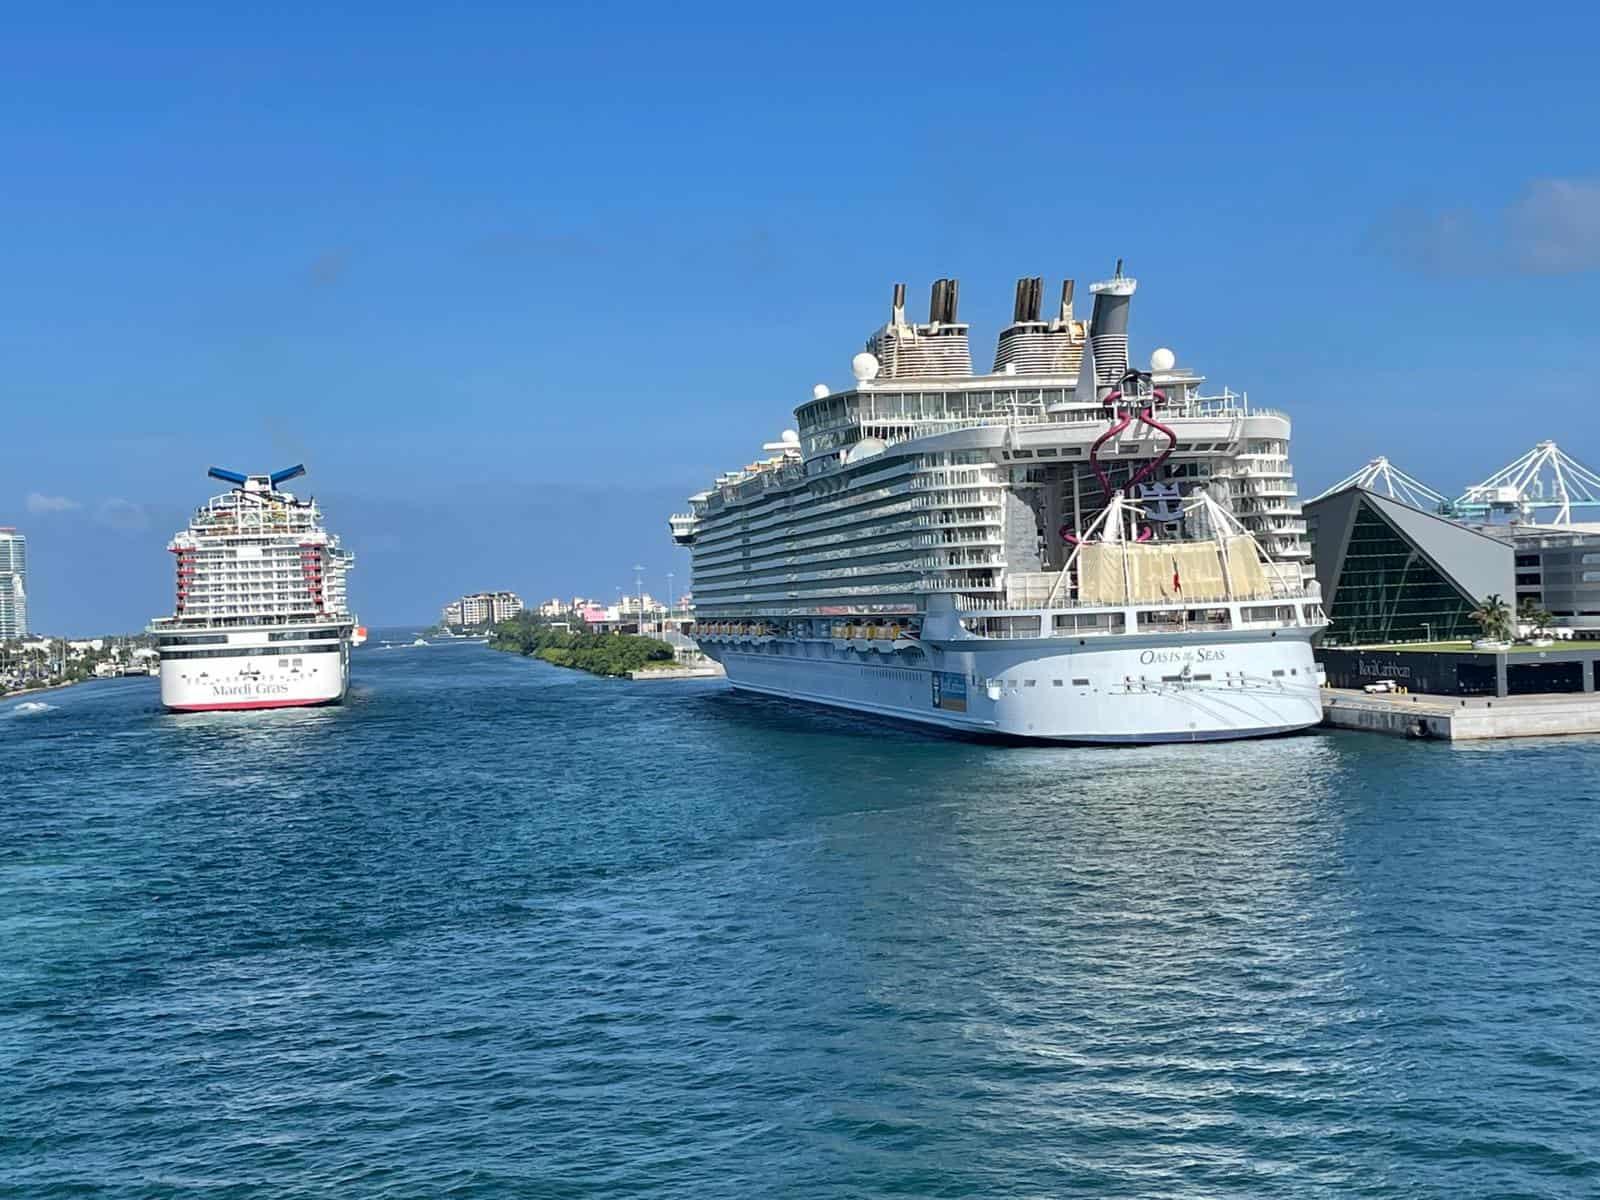 mardi gras and oasis of the seas PortMiami multiple ships